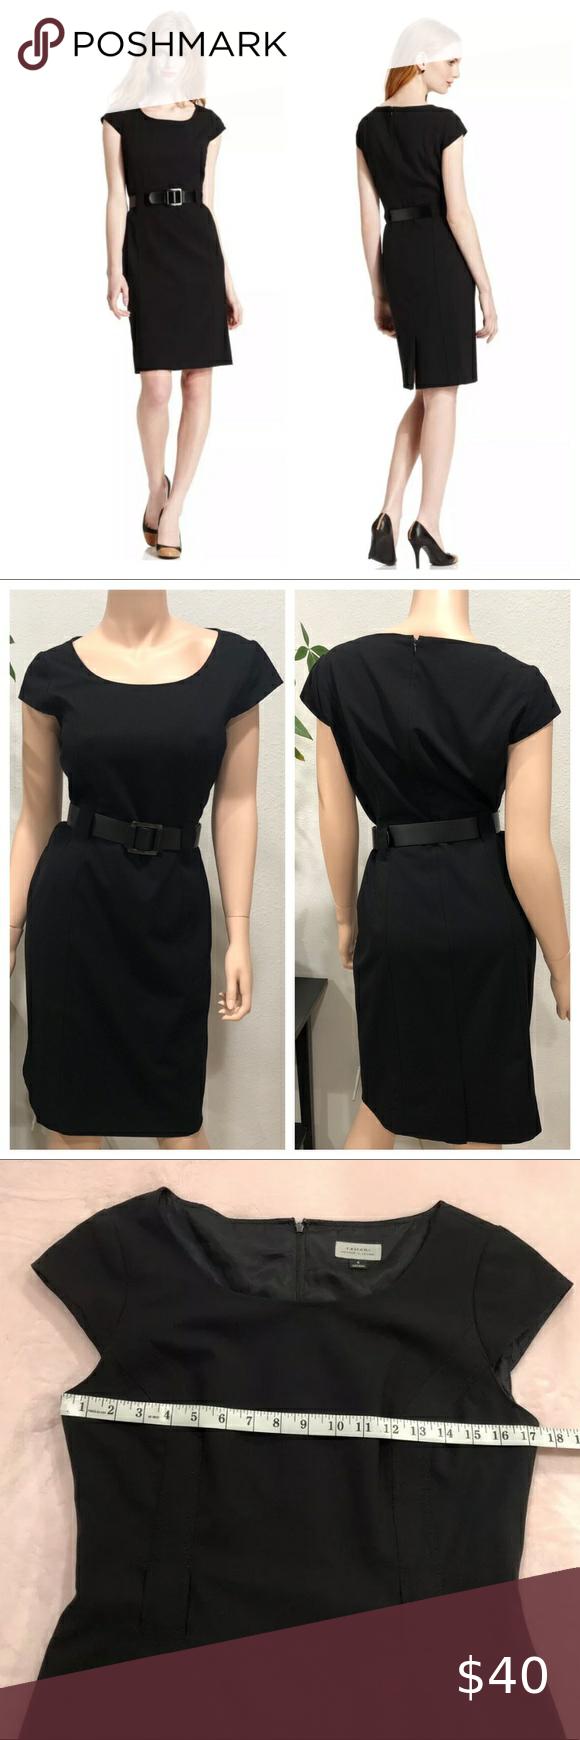 Tahari Asl Cap Sleeve Belted Sheath Dress Size 8 Black Sheath Dress Sheath Dress Tahari Dress [ 1740 x 580 Pixel ]